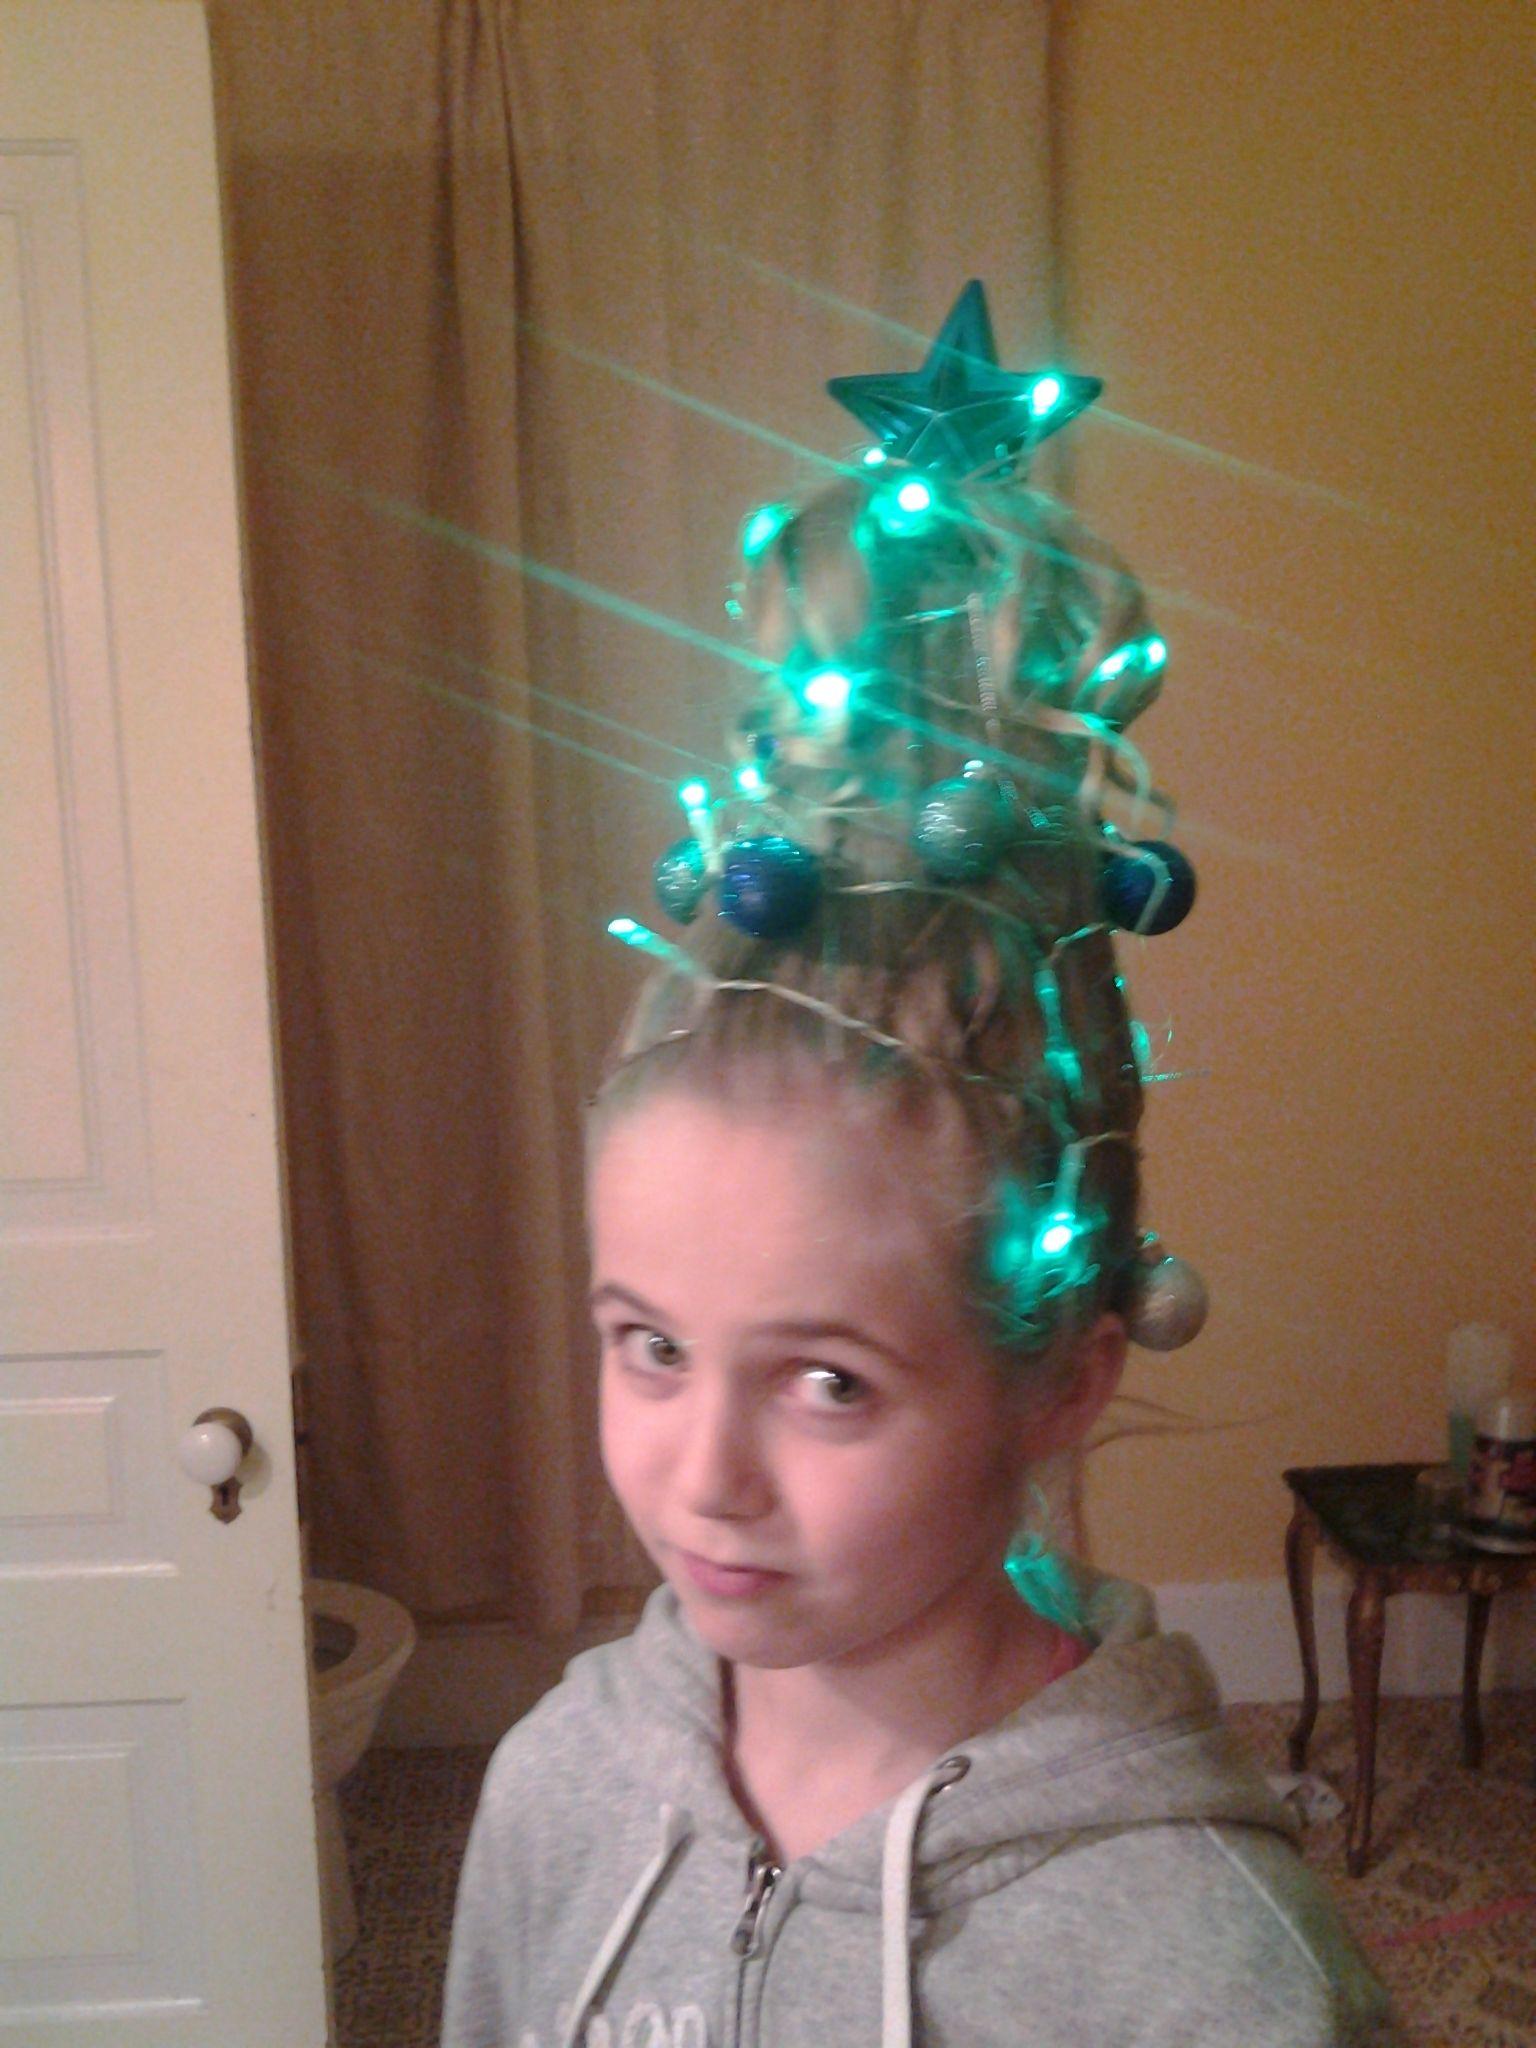 crazy christmas hair style. styrofoam cup inside hair. star stuck in ...